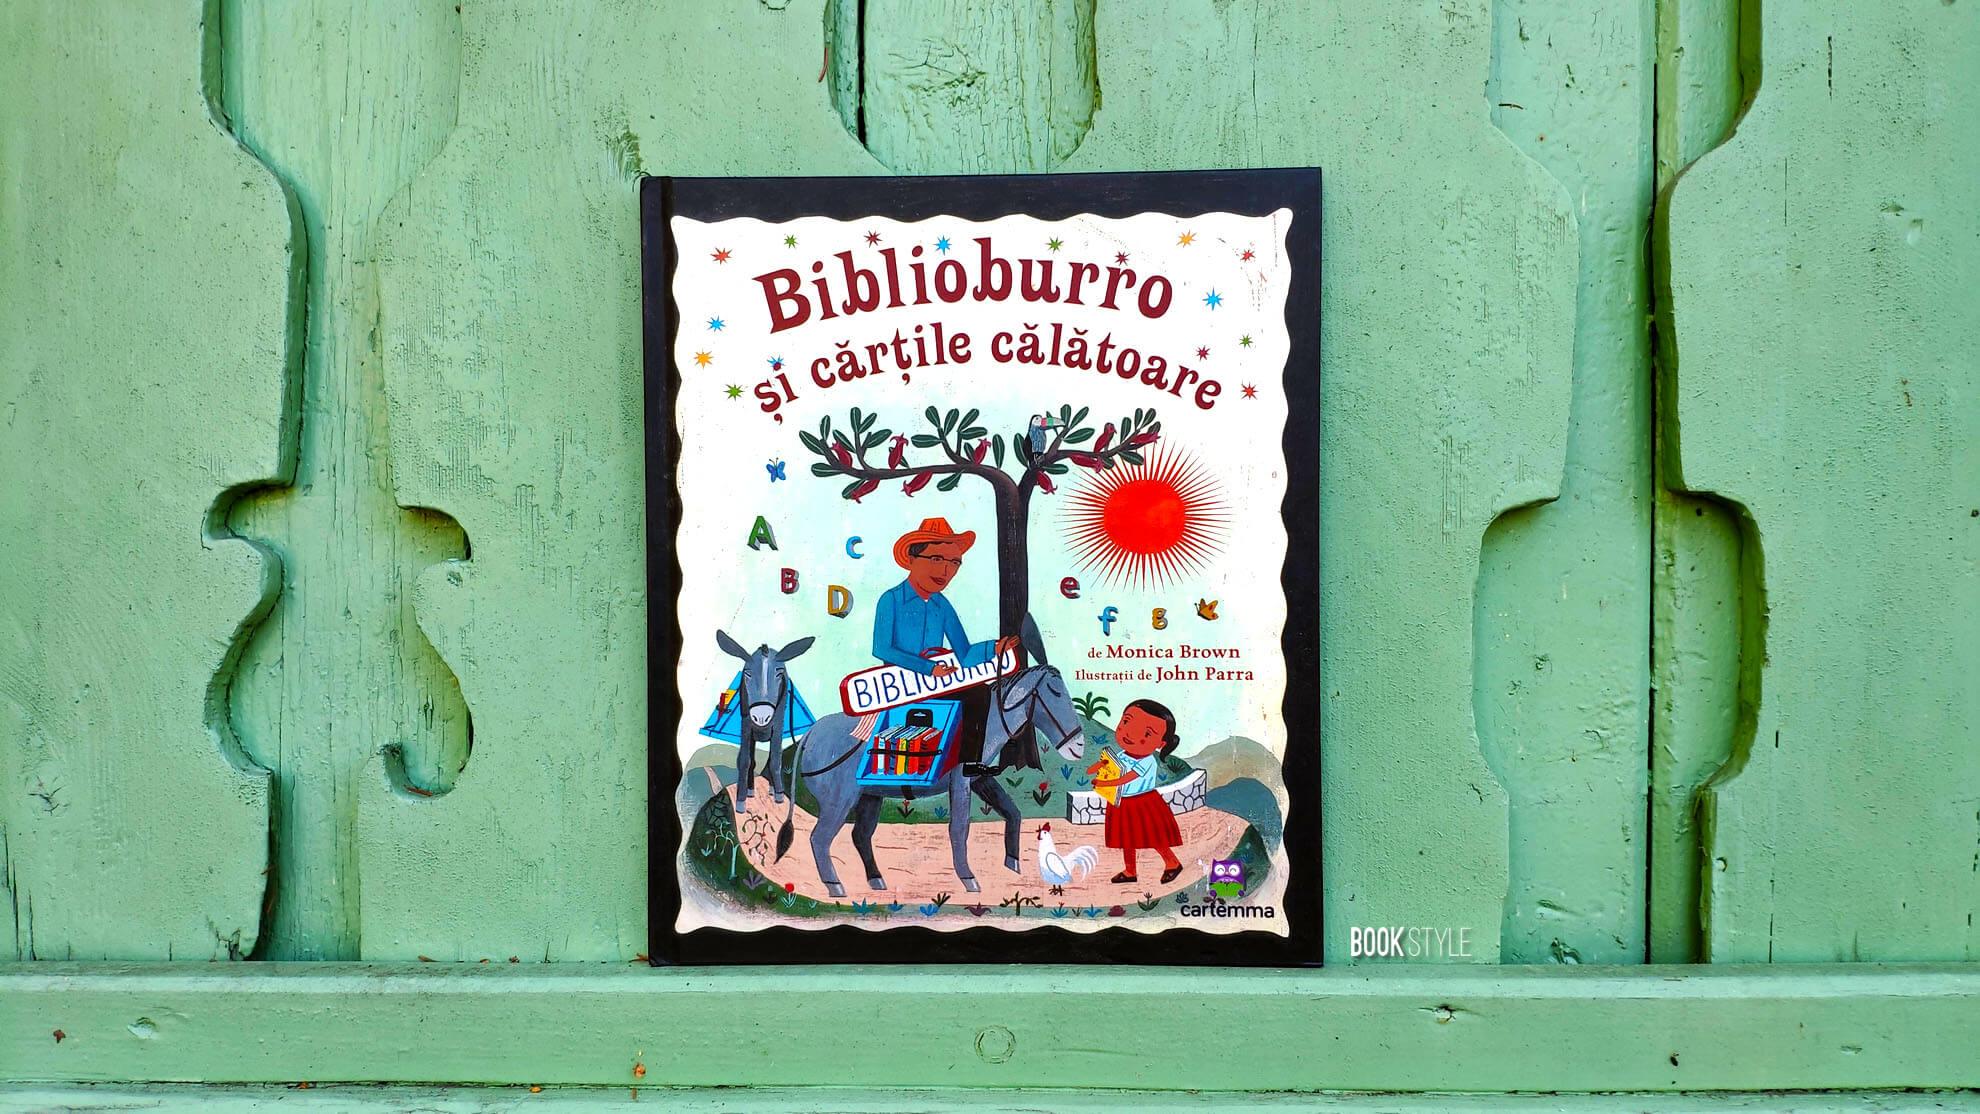 Biblioburro, de Monica Brown și John Parra | Editura Cartemma ISBN: 9786069025017